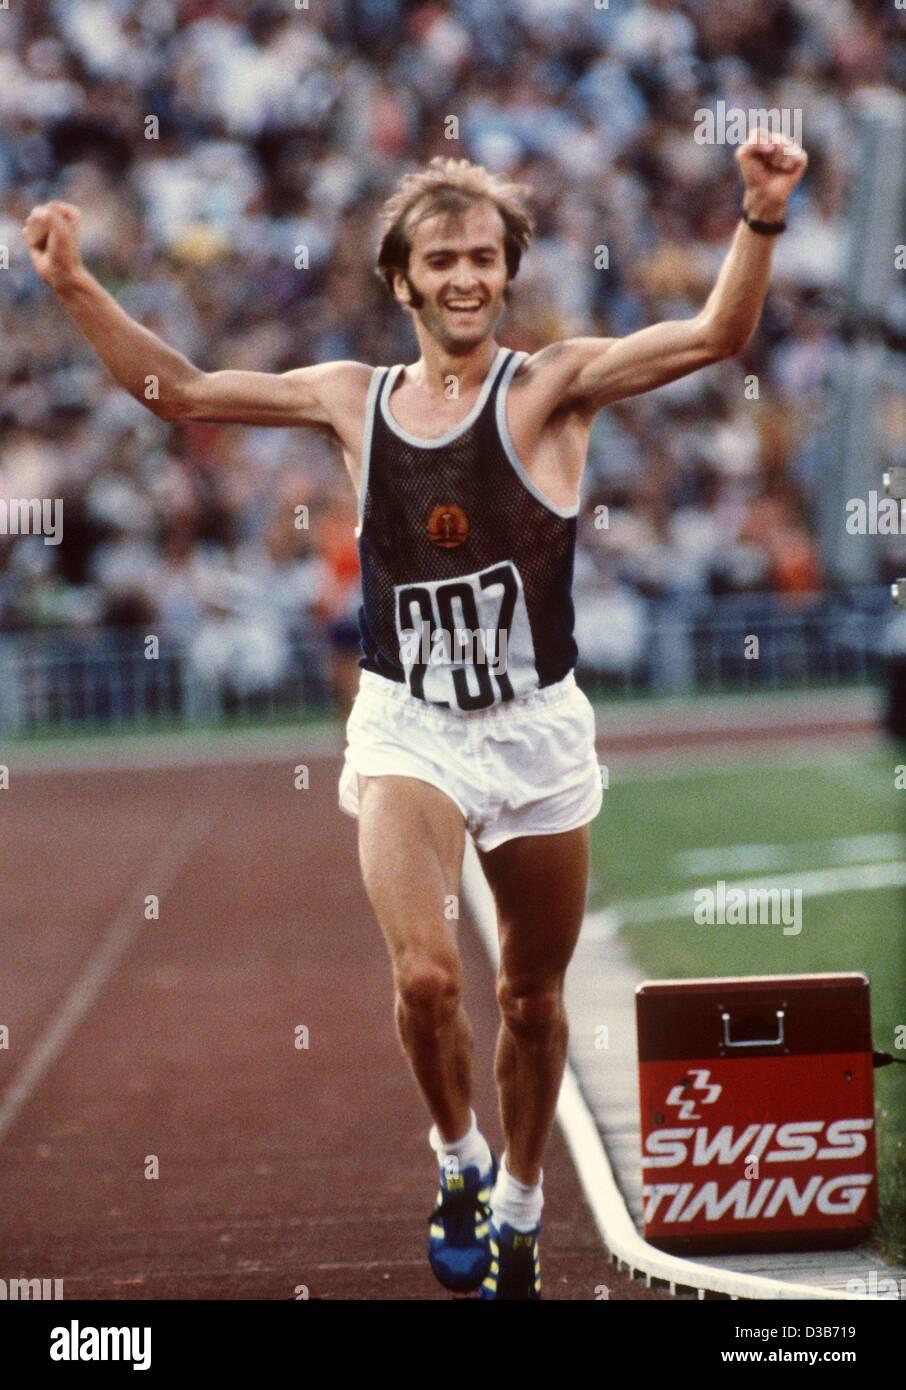 (dpa files) - East German runner Waldemar Cierpinski crosses the finish line of the marathon in the Lenin Stadium - Stock Image